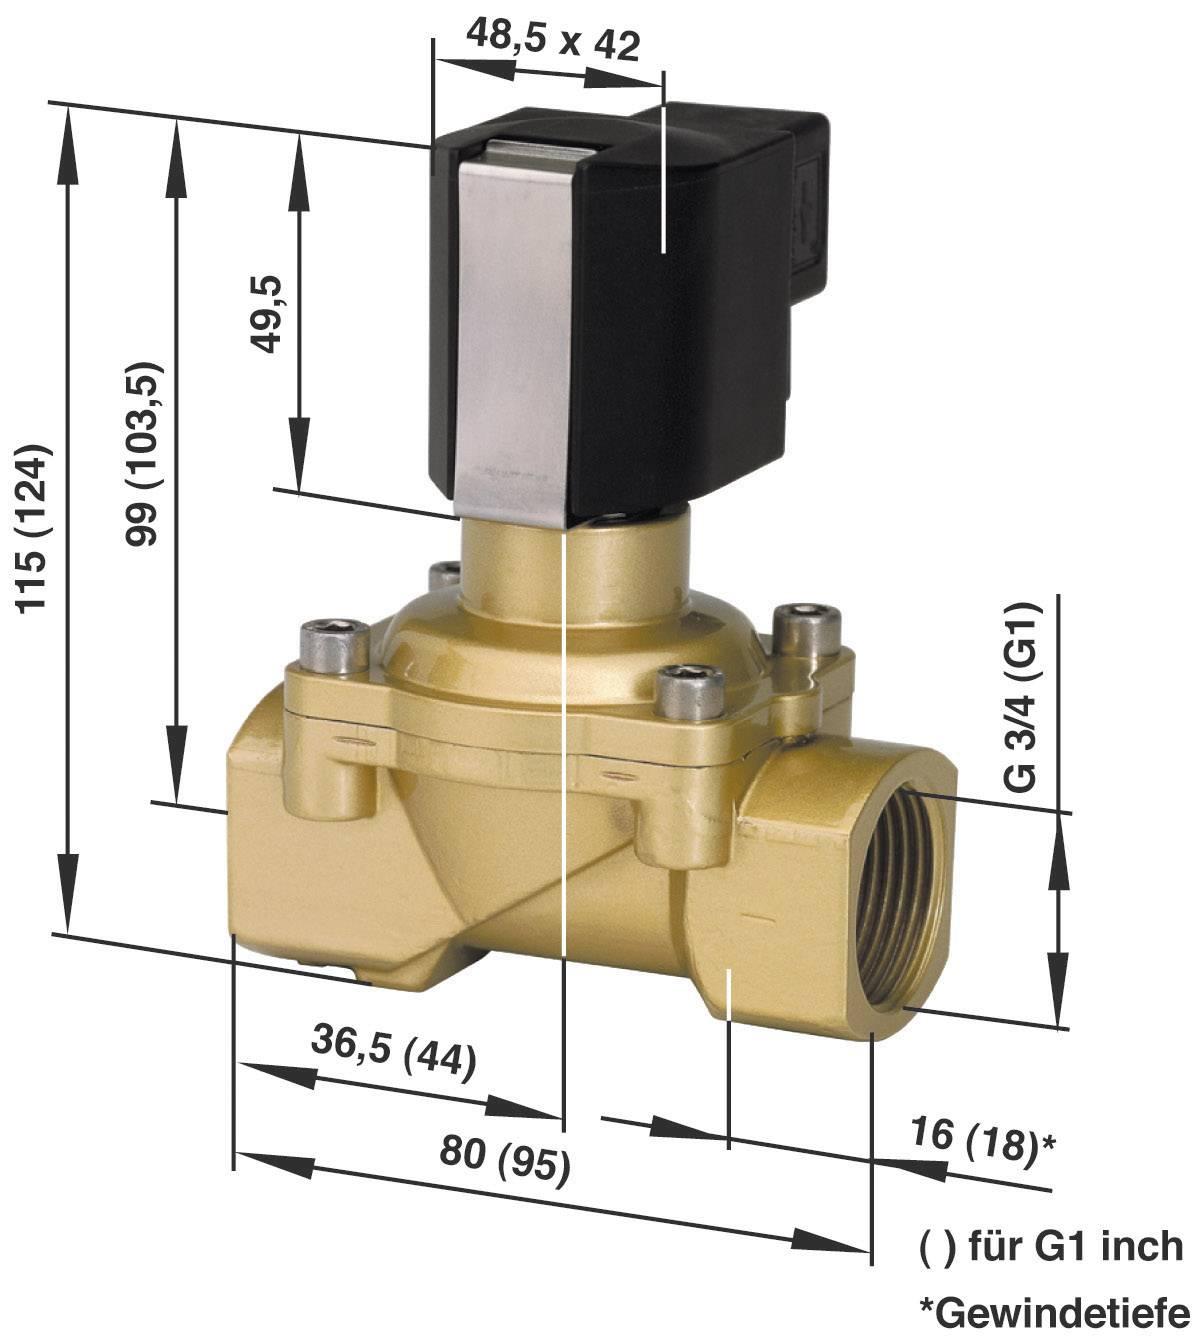 2/2-cestný mechanicky odolný ventil pneumatiky Busch Jost 8254400.9151.02400, G 1, 24 V/DC